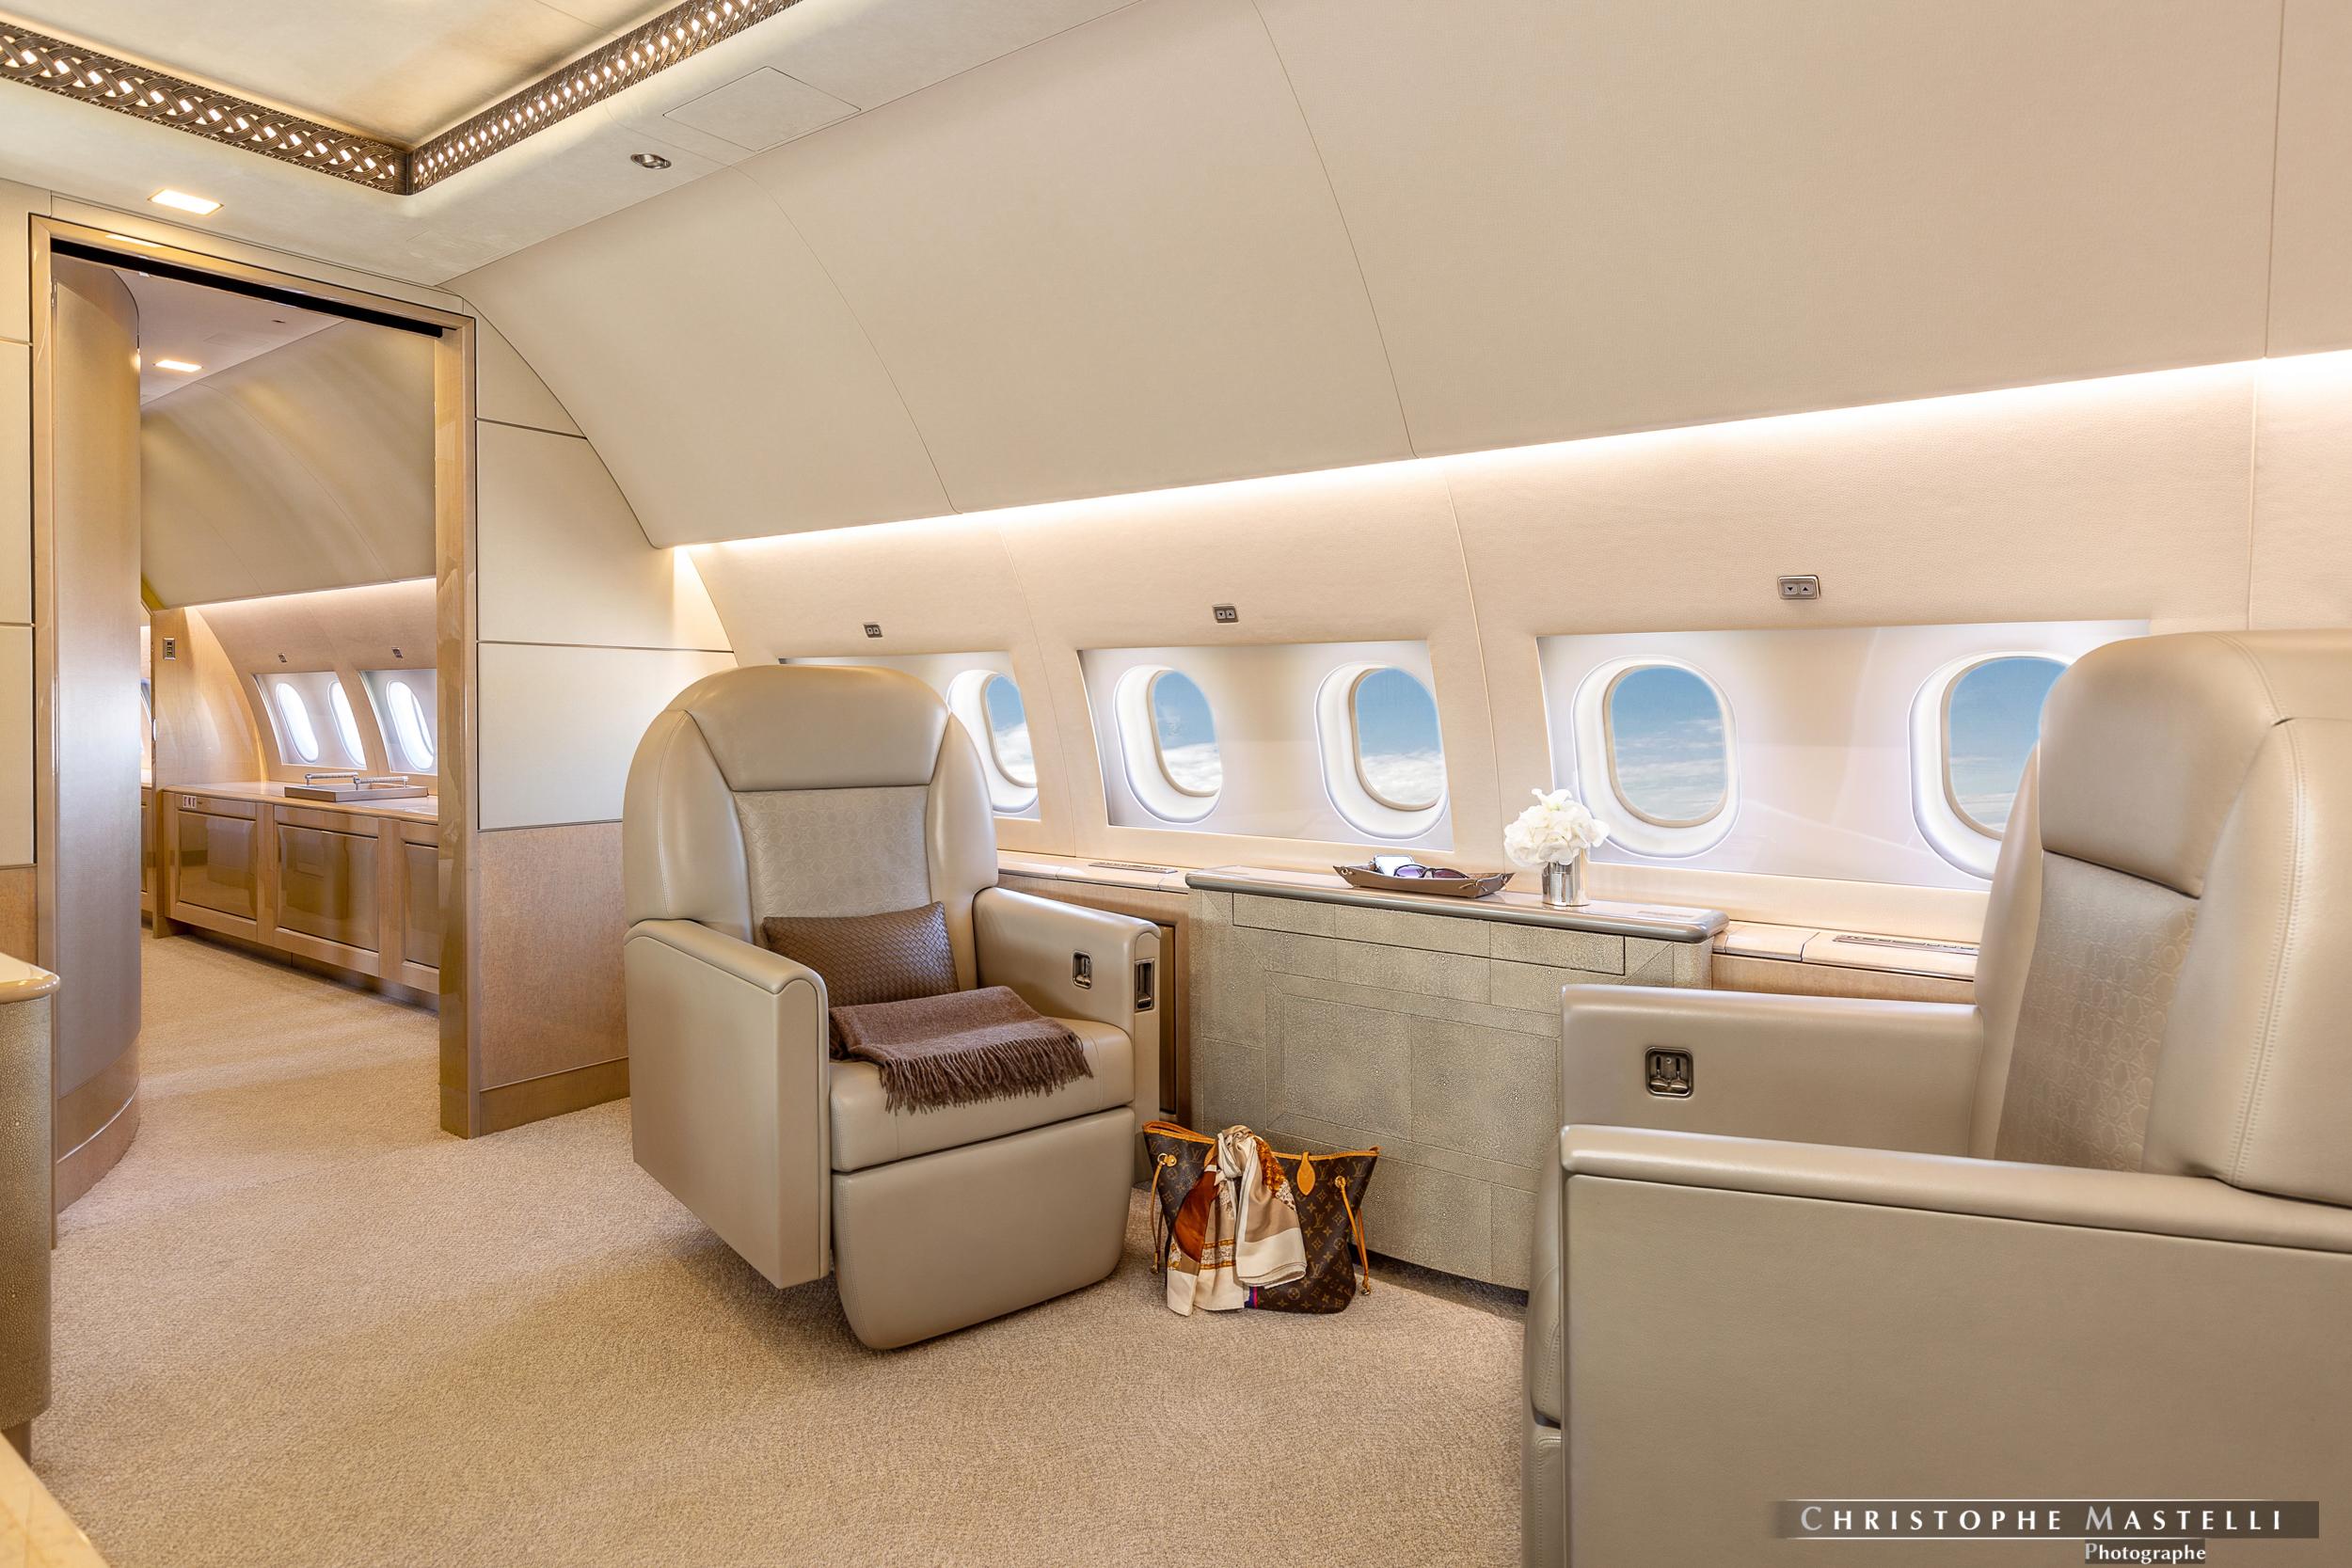 christophe-mastelli-photographe-luxury-jet-prive-luxe